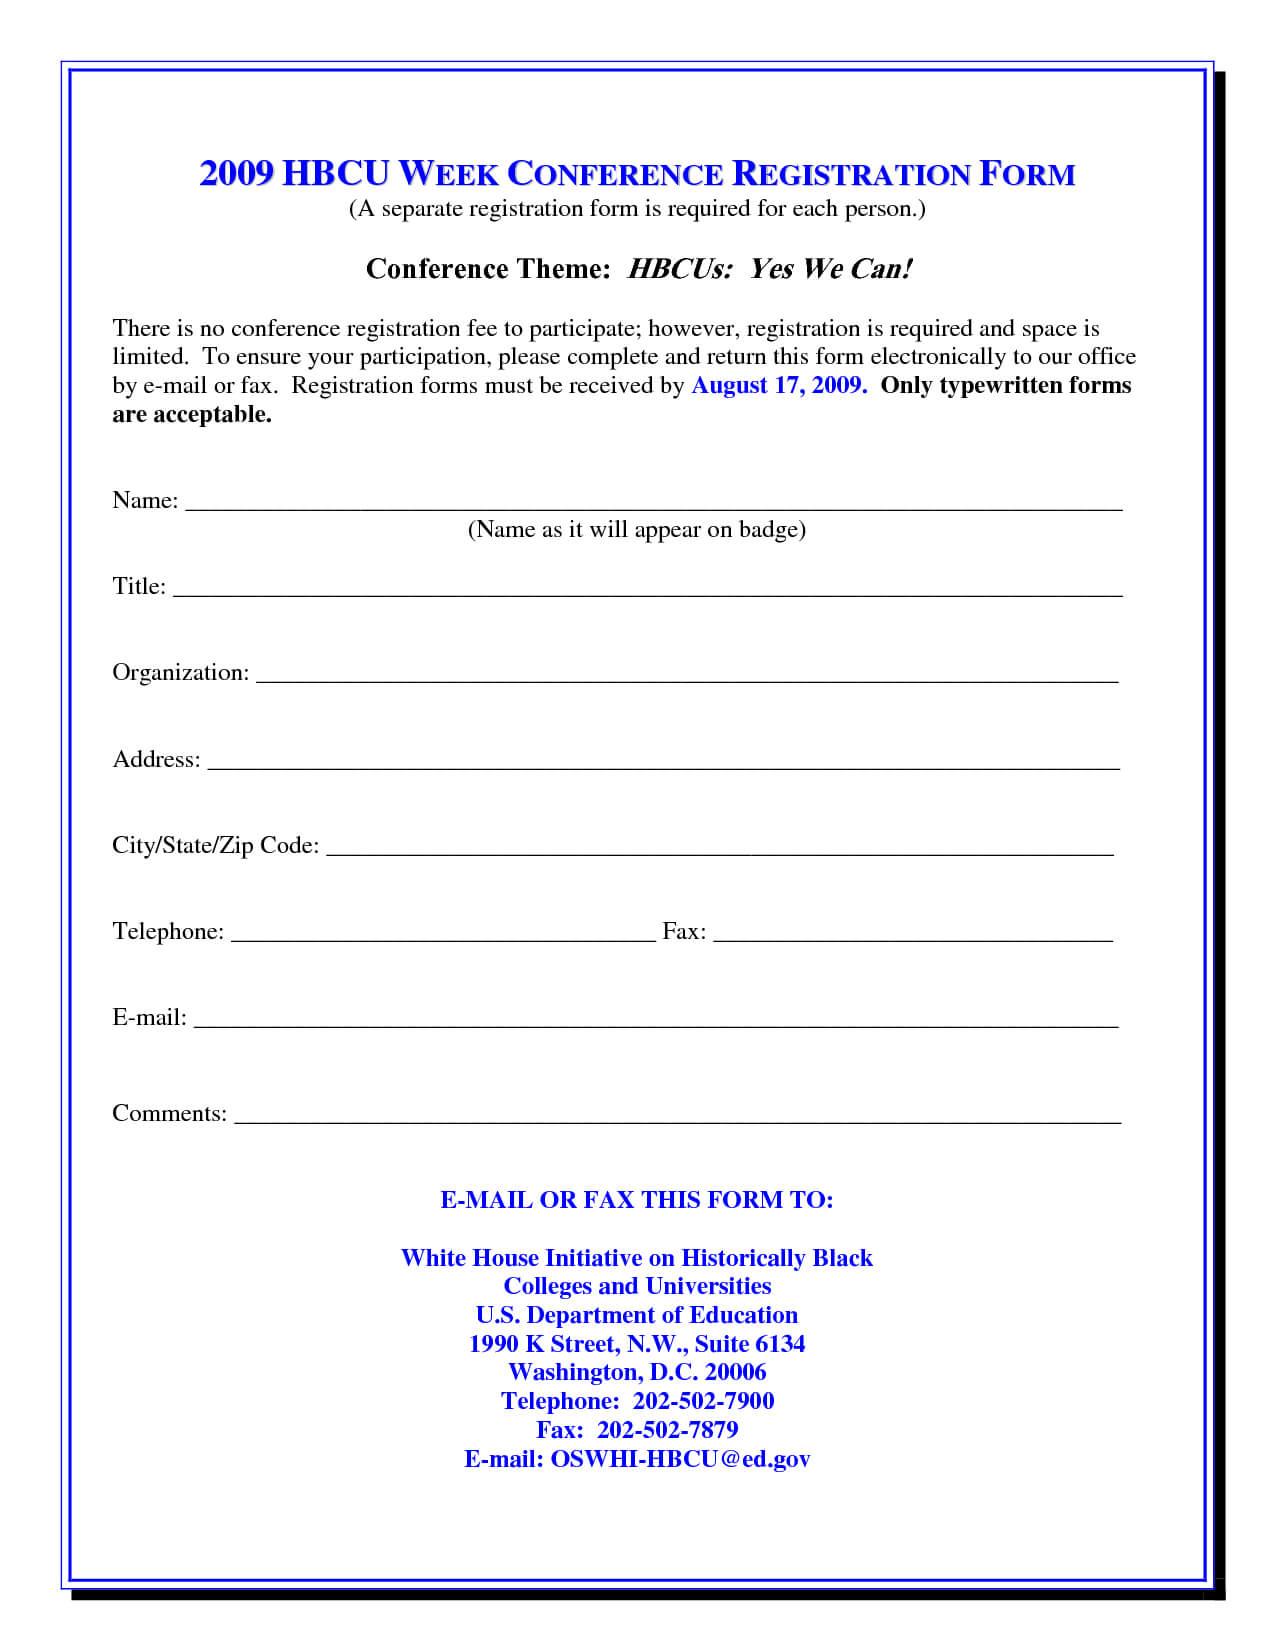 017 Template Ideas Class Registration Form Word 317167 Forms For Seminar Registration Form Template Word